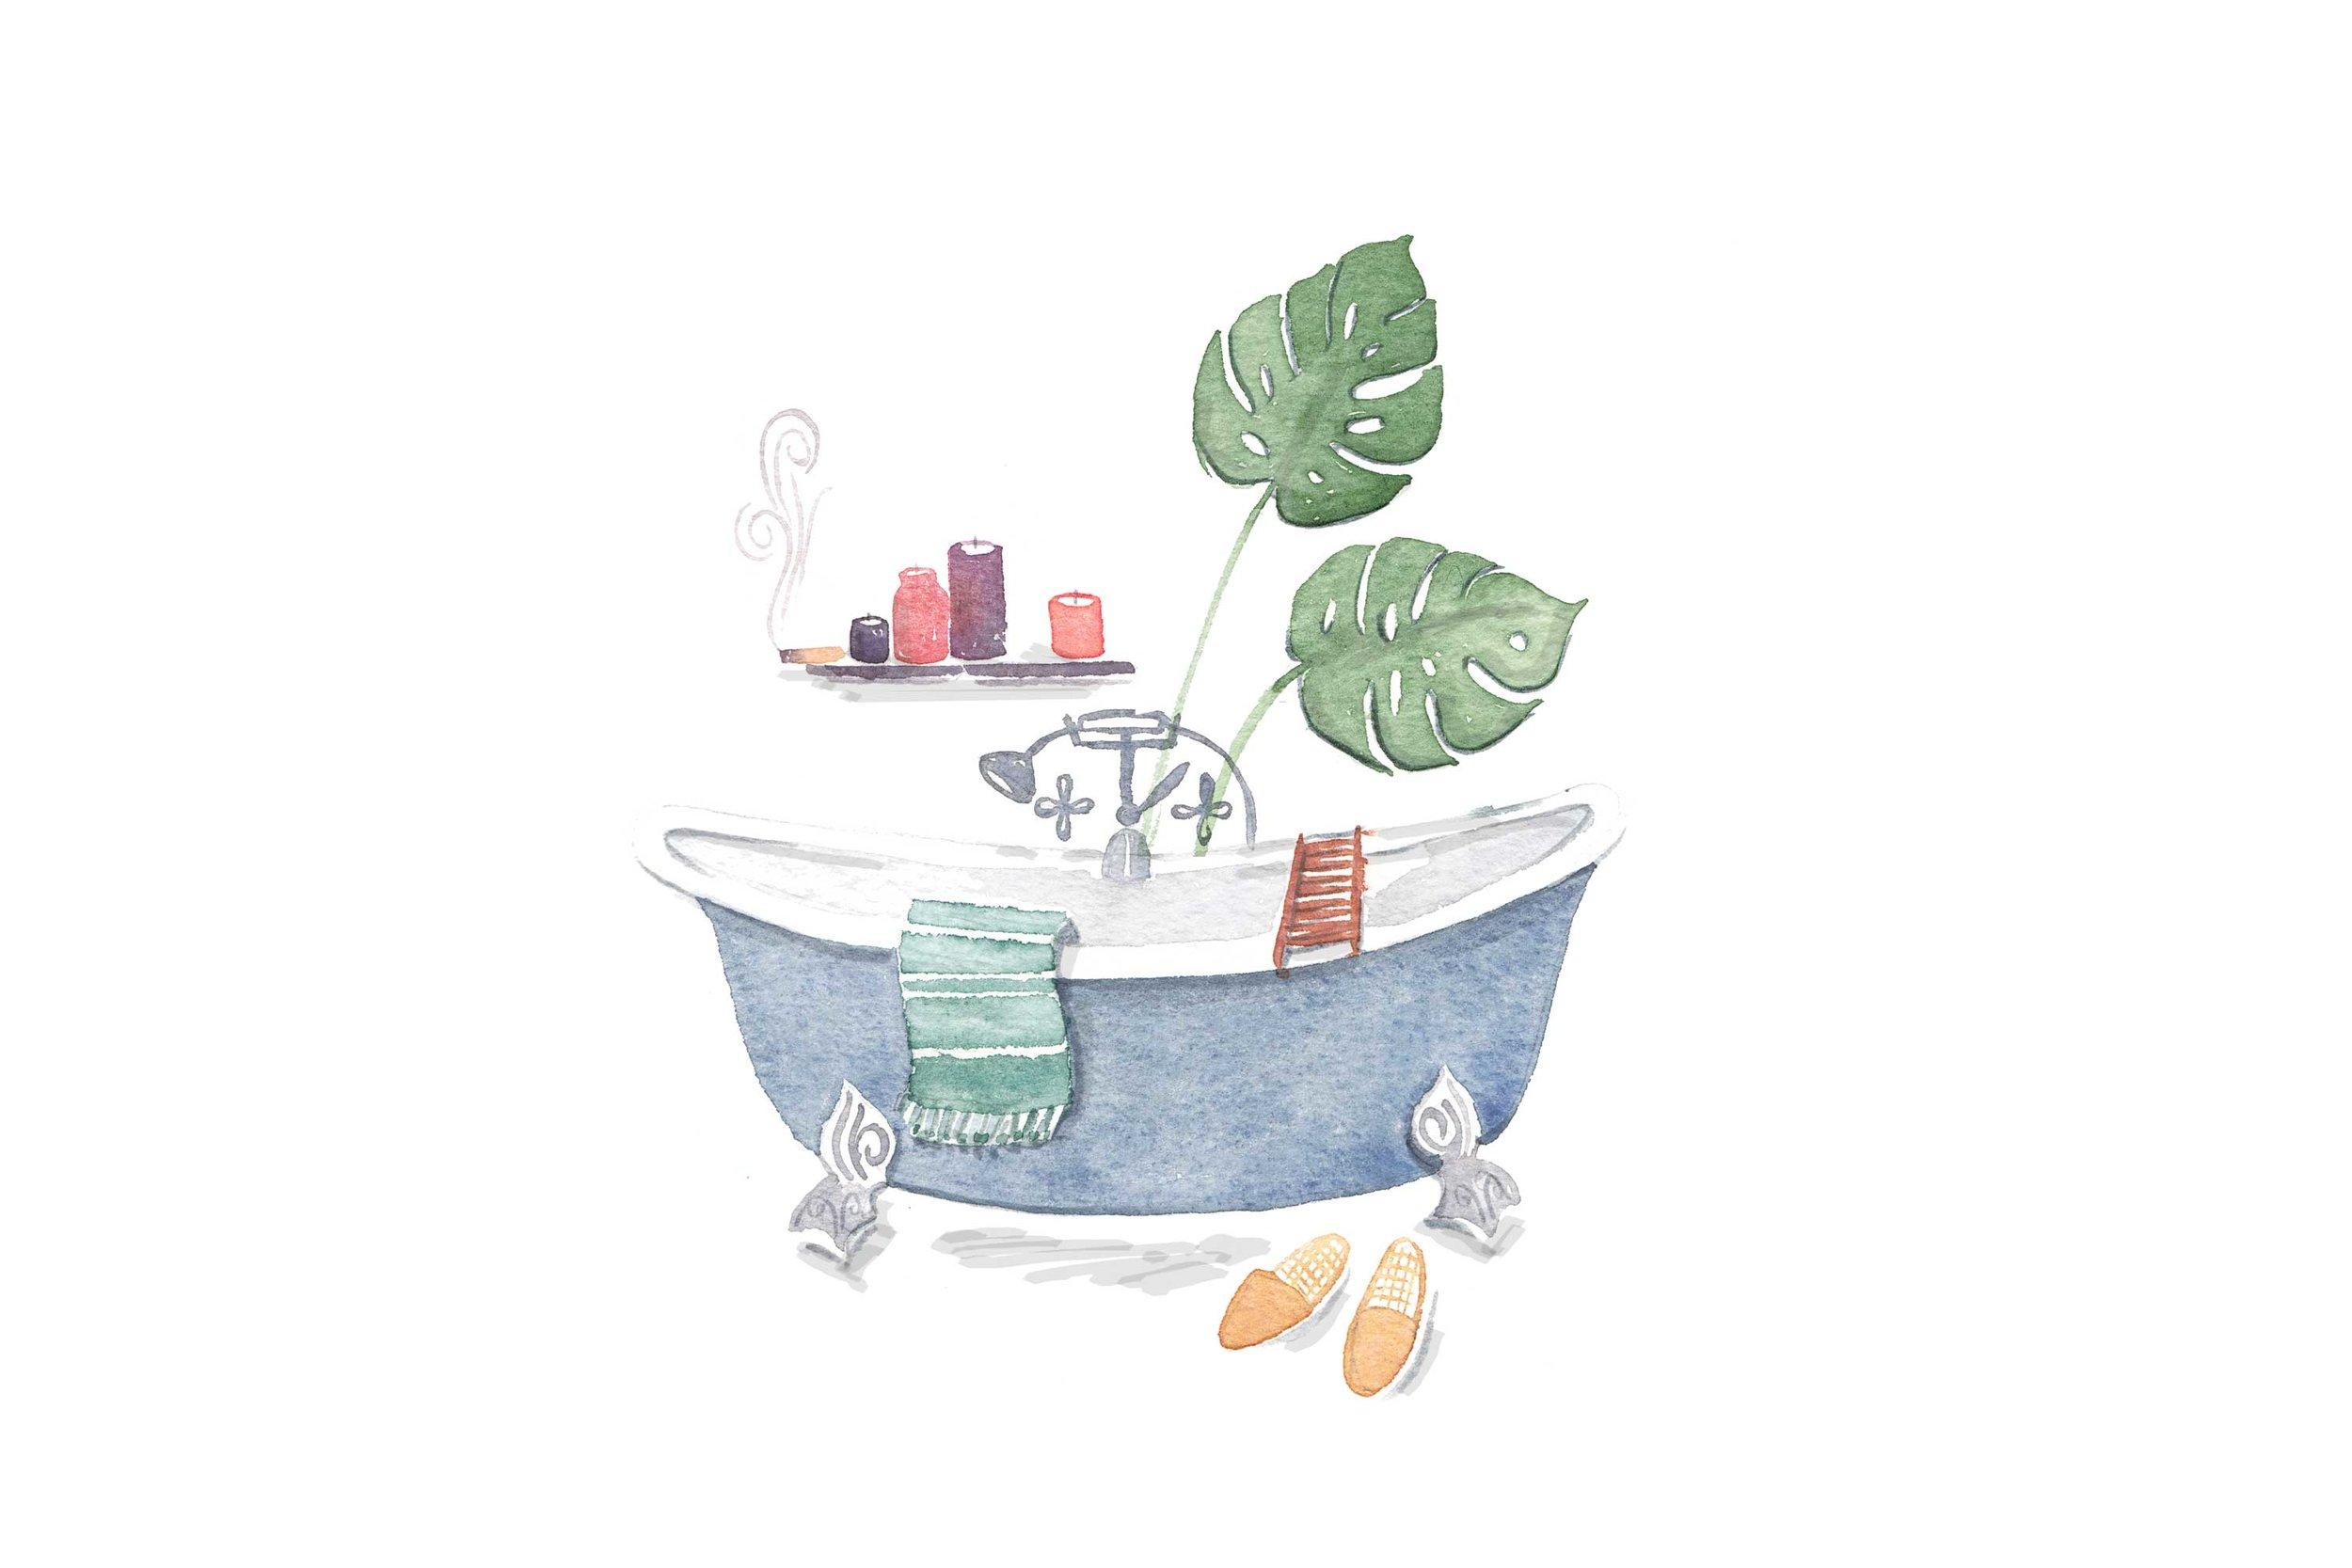 erin-ellis_lifestyle_watercolor_illustrations_bathtub_scene_well+good.jpg